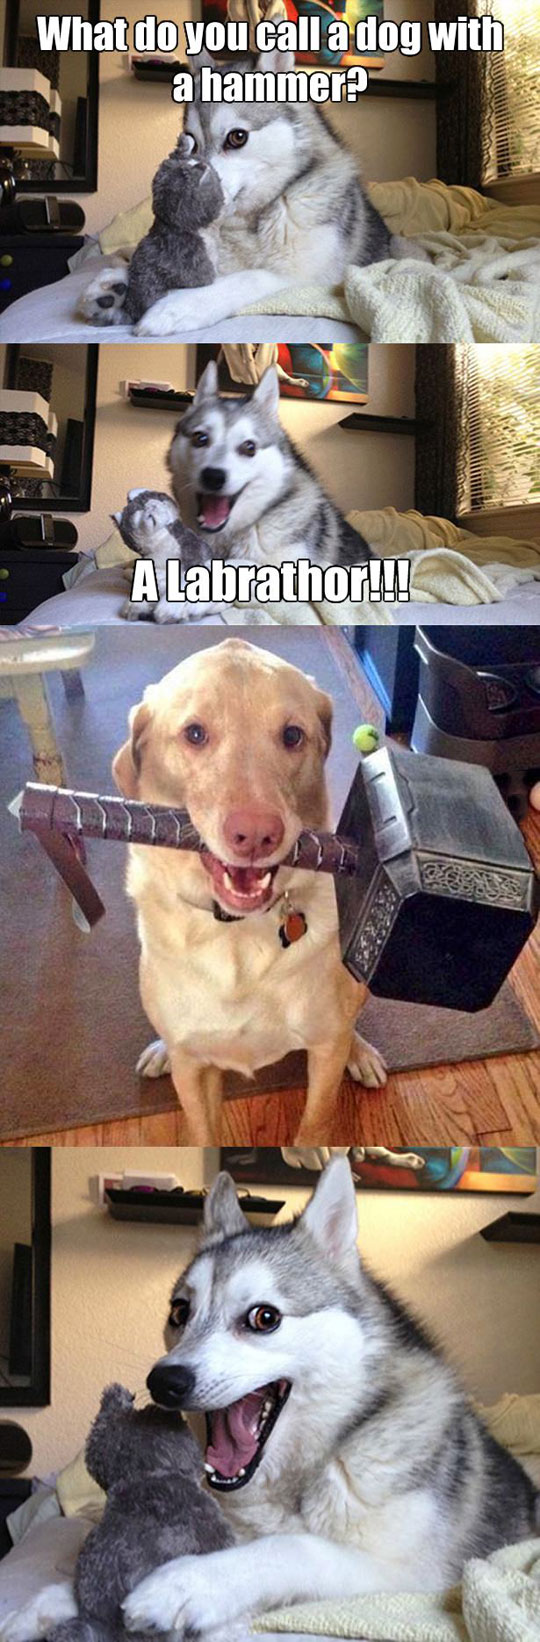 cool-joke-dog-Thor-hammer